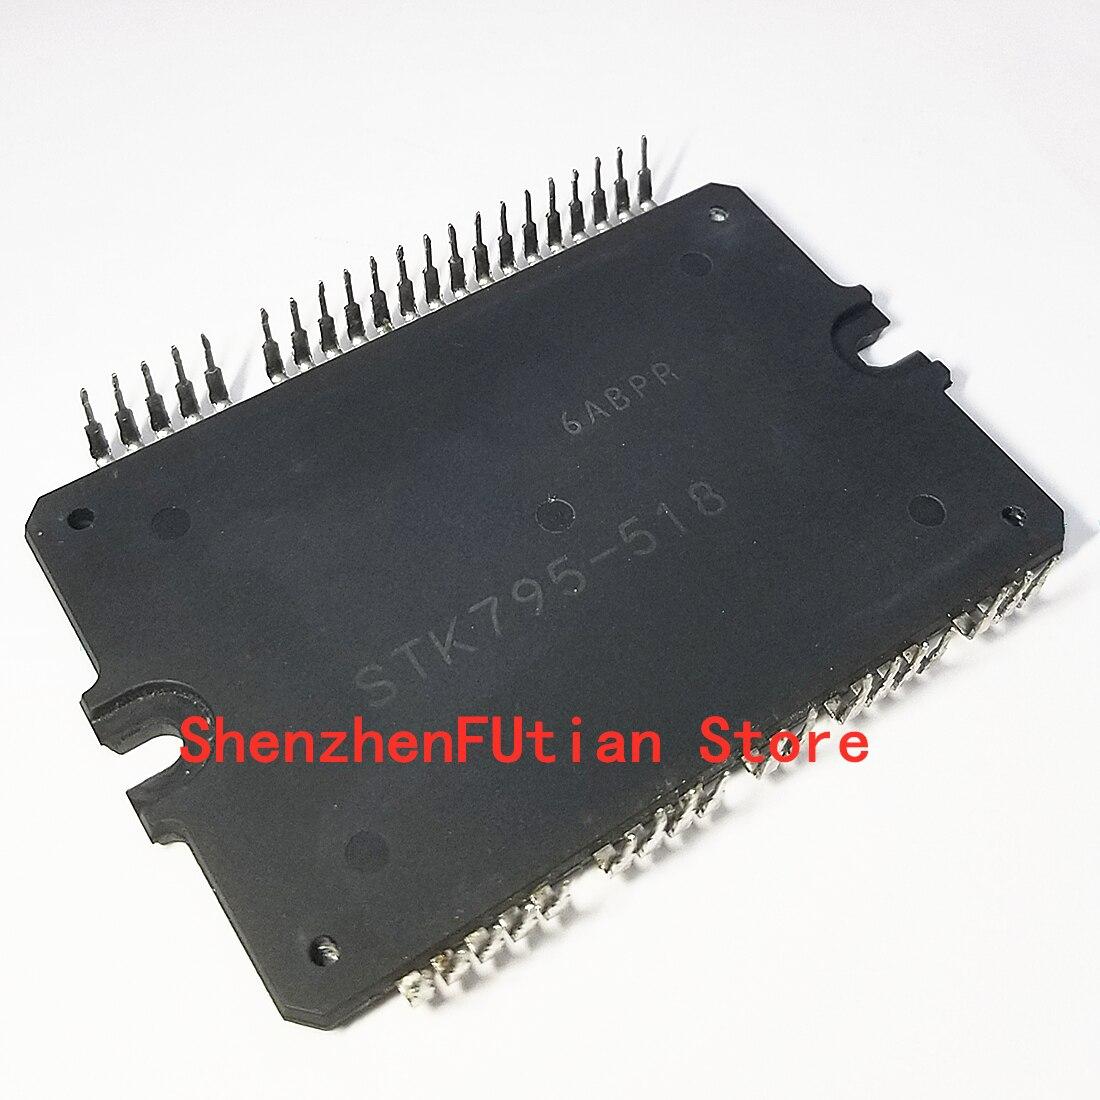 1pcs/lot STK795-518 STK795-5I8 HYB39 New Power Module